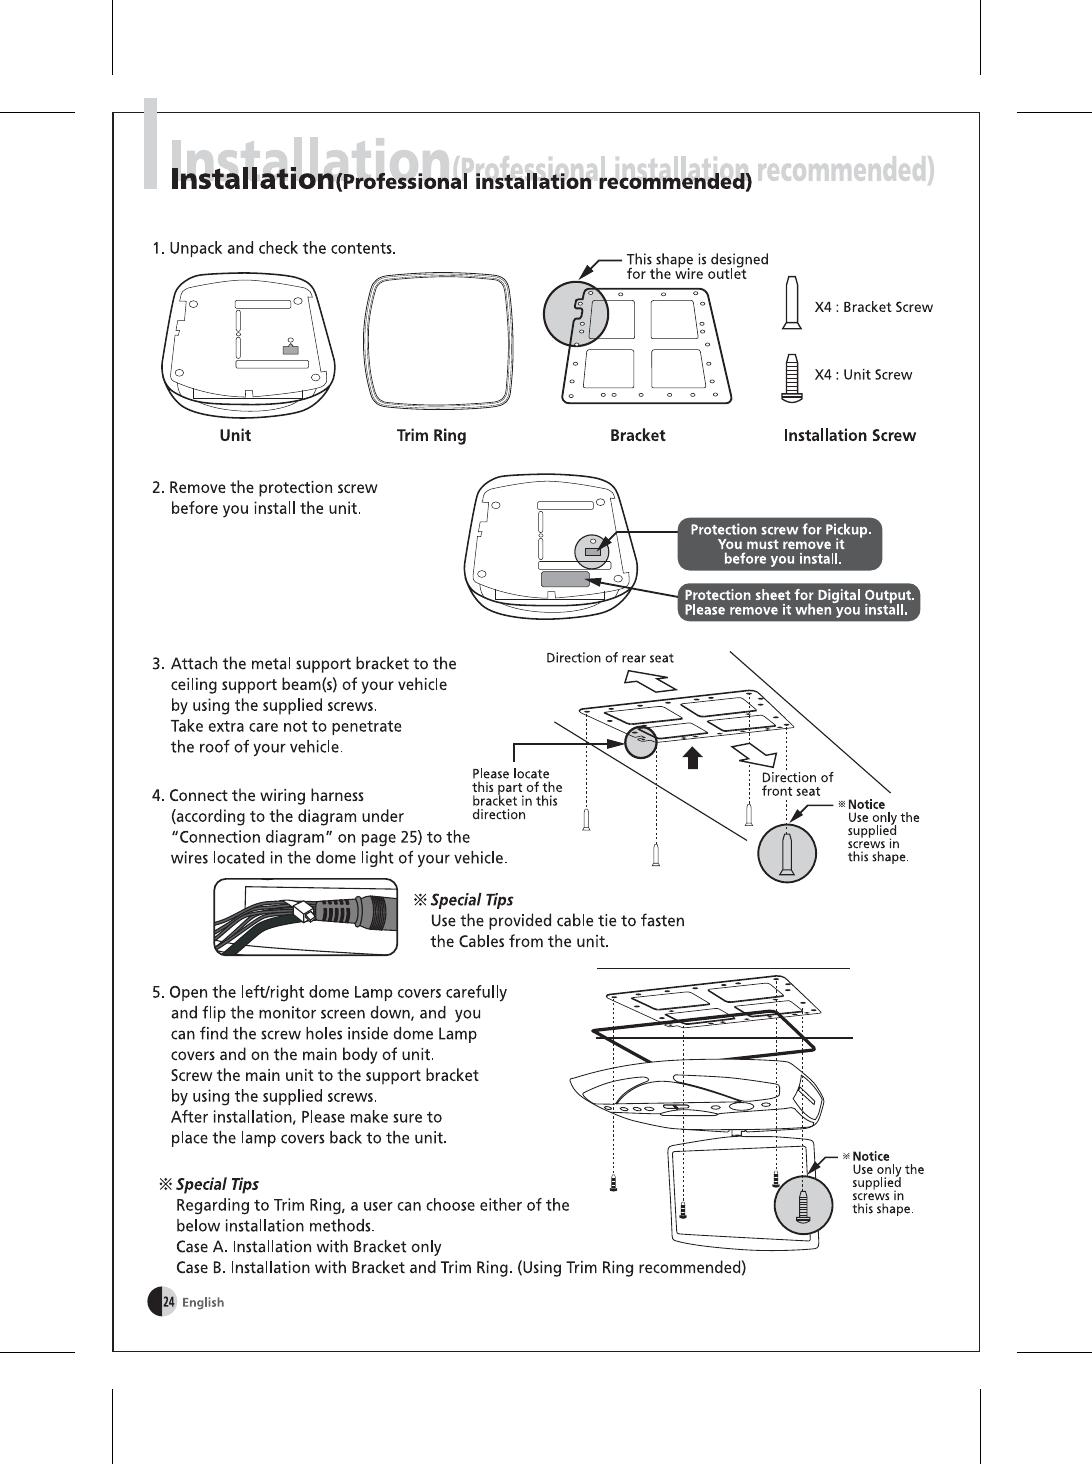 overhead dvd player wiring diagram rockville flip down monitor wiring diagram wiring diagram data  rockville flip down monitor wiring